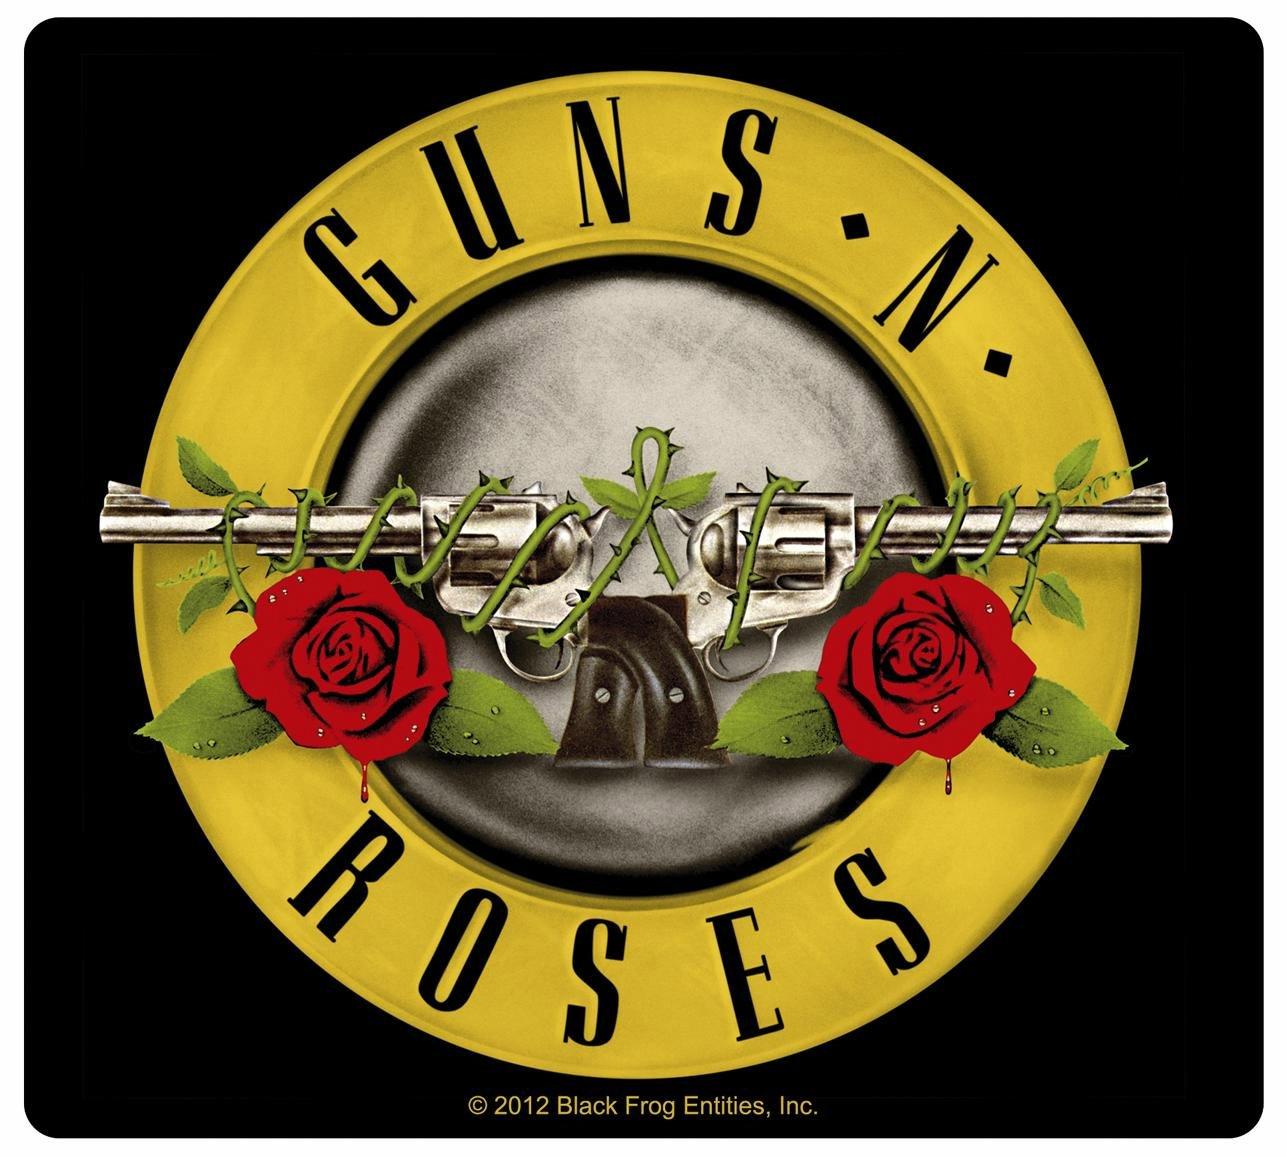 Fotos   Guns N Roses Black Logo On White Background 1287x1157